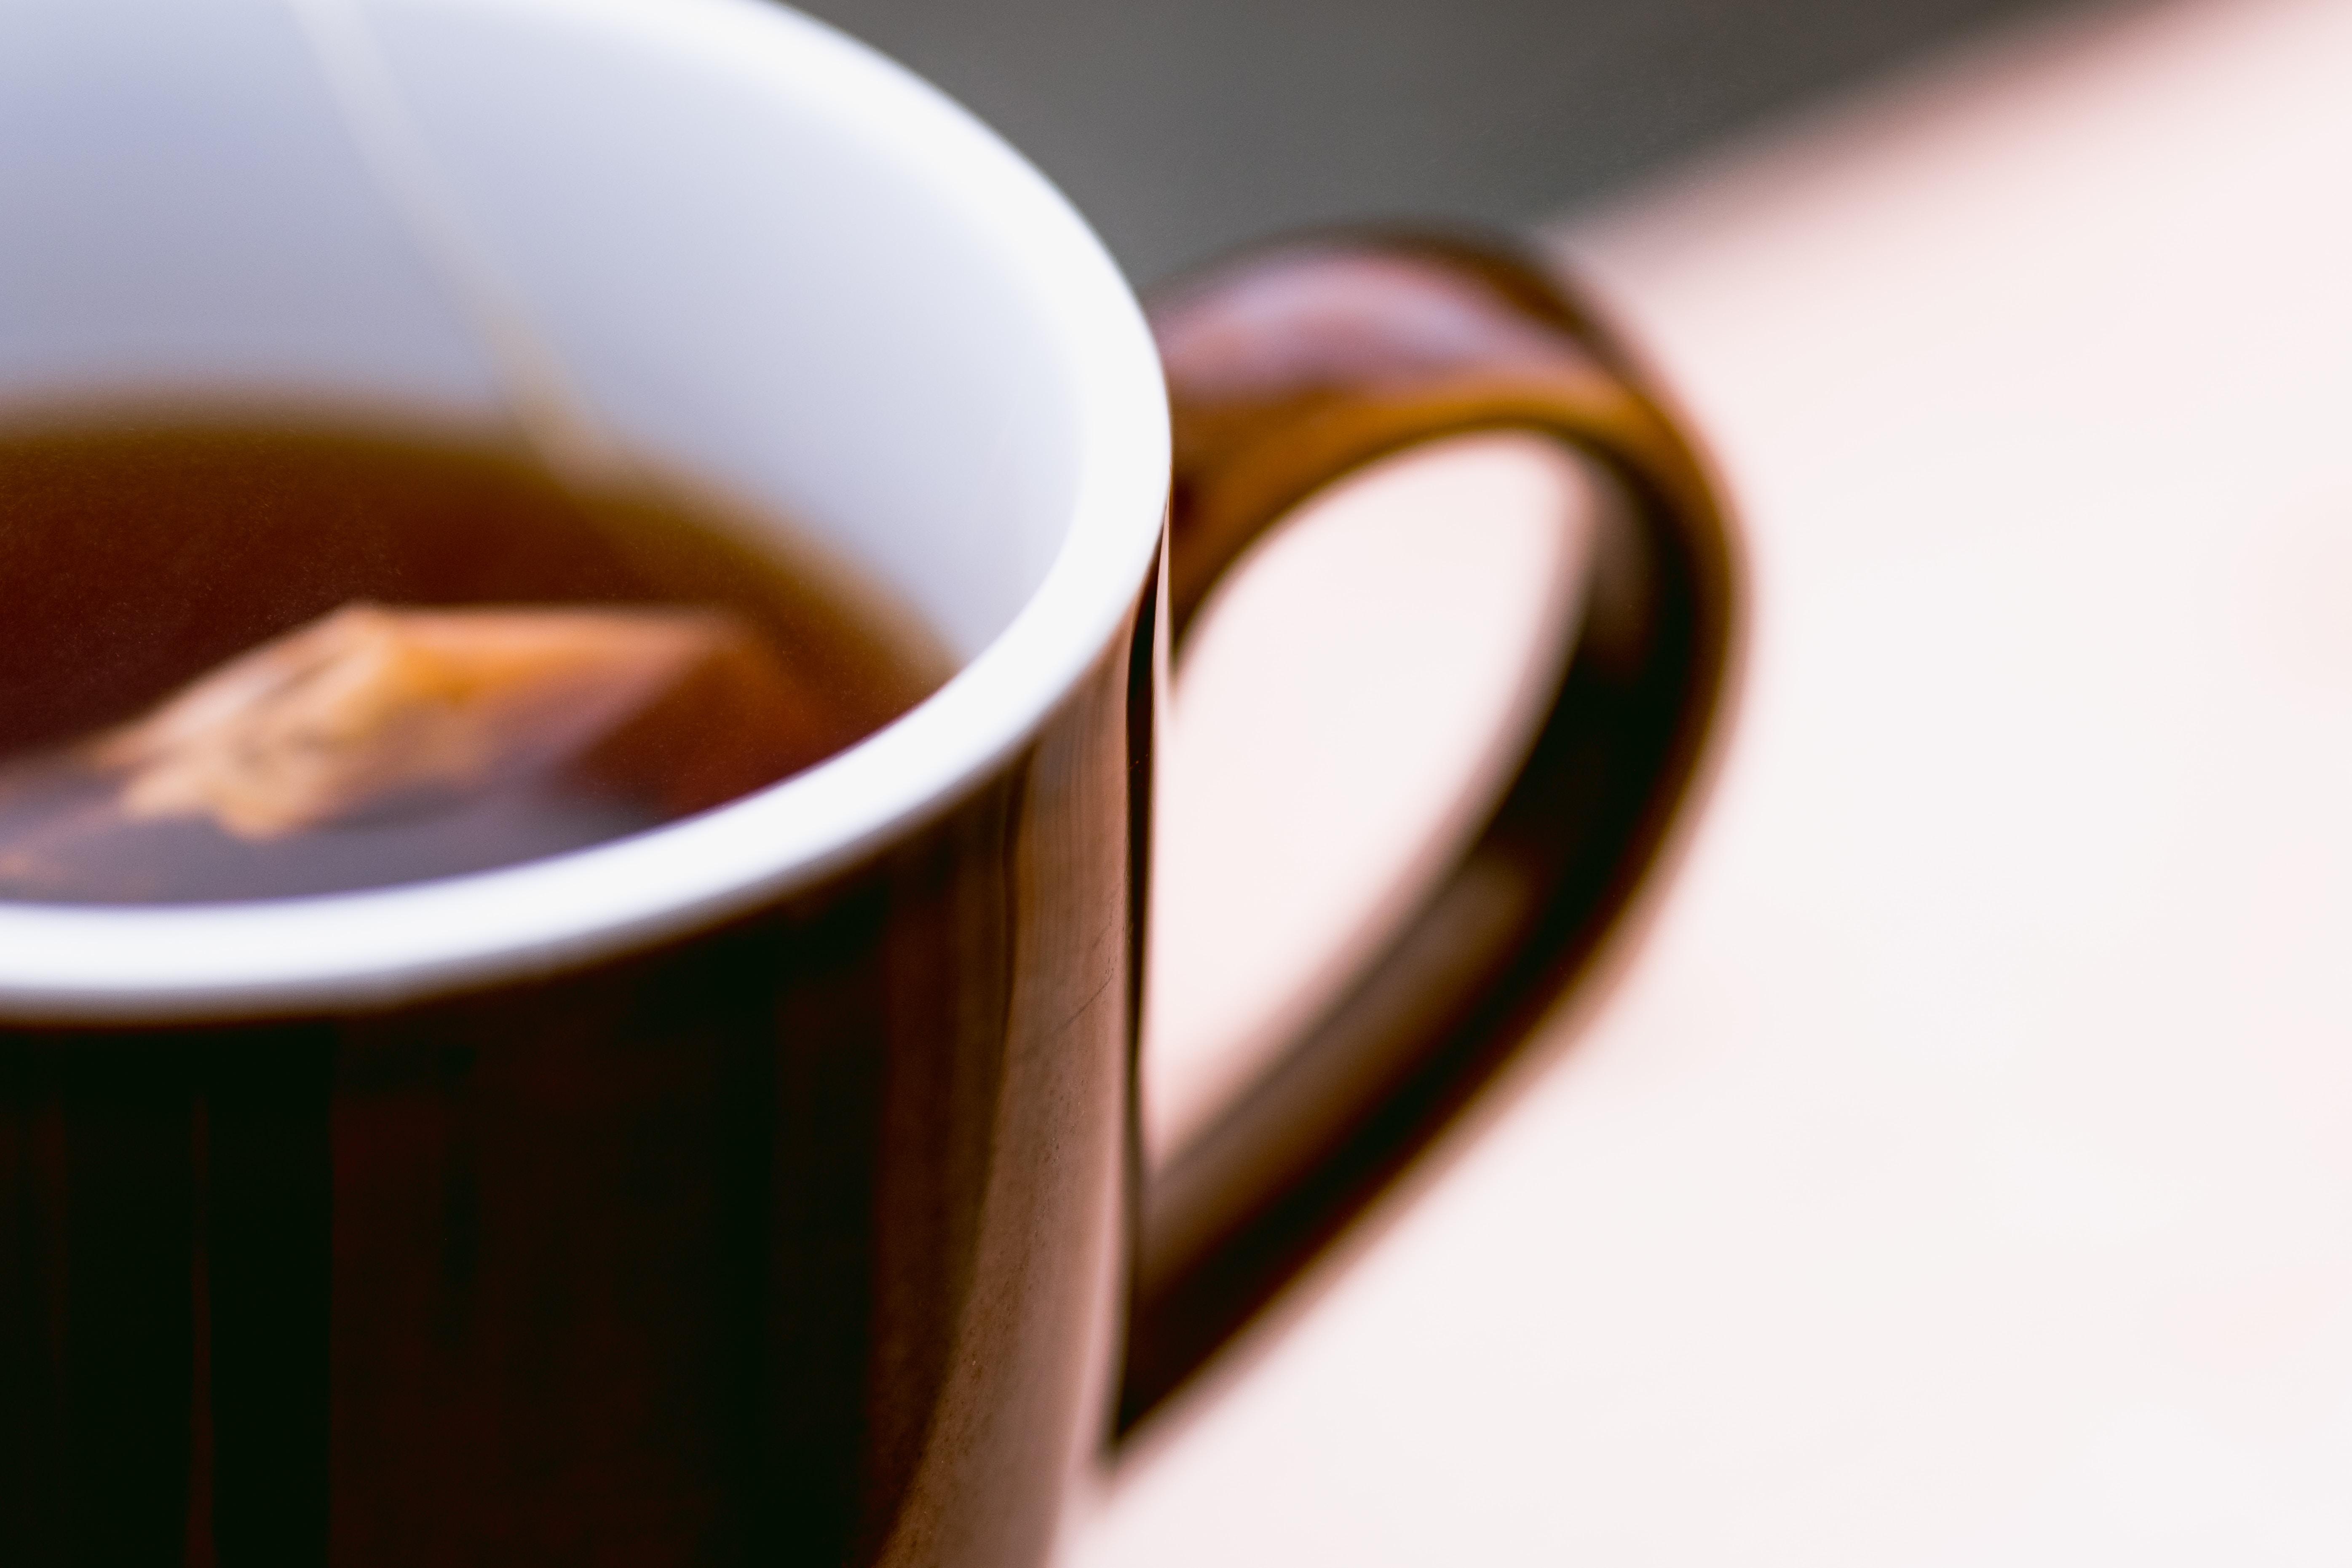 brown ceramic mug with brown liquid inside